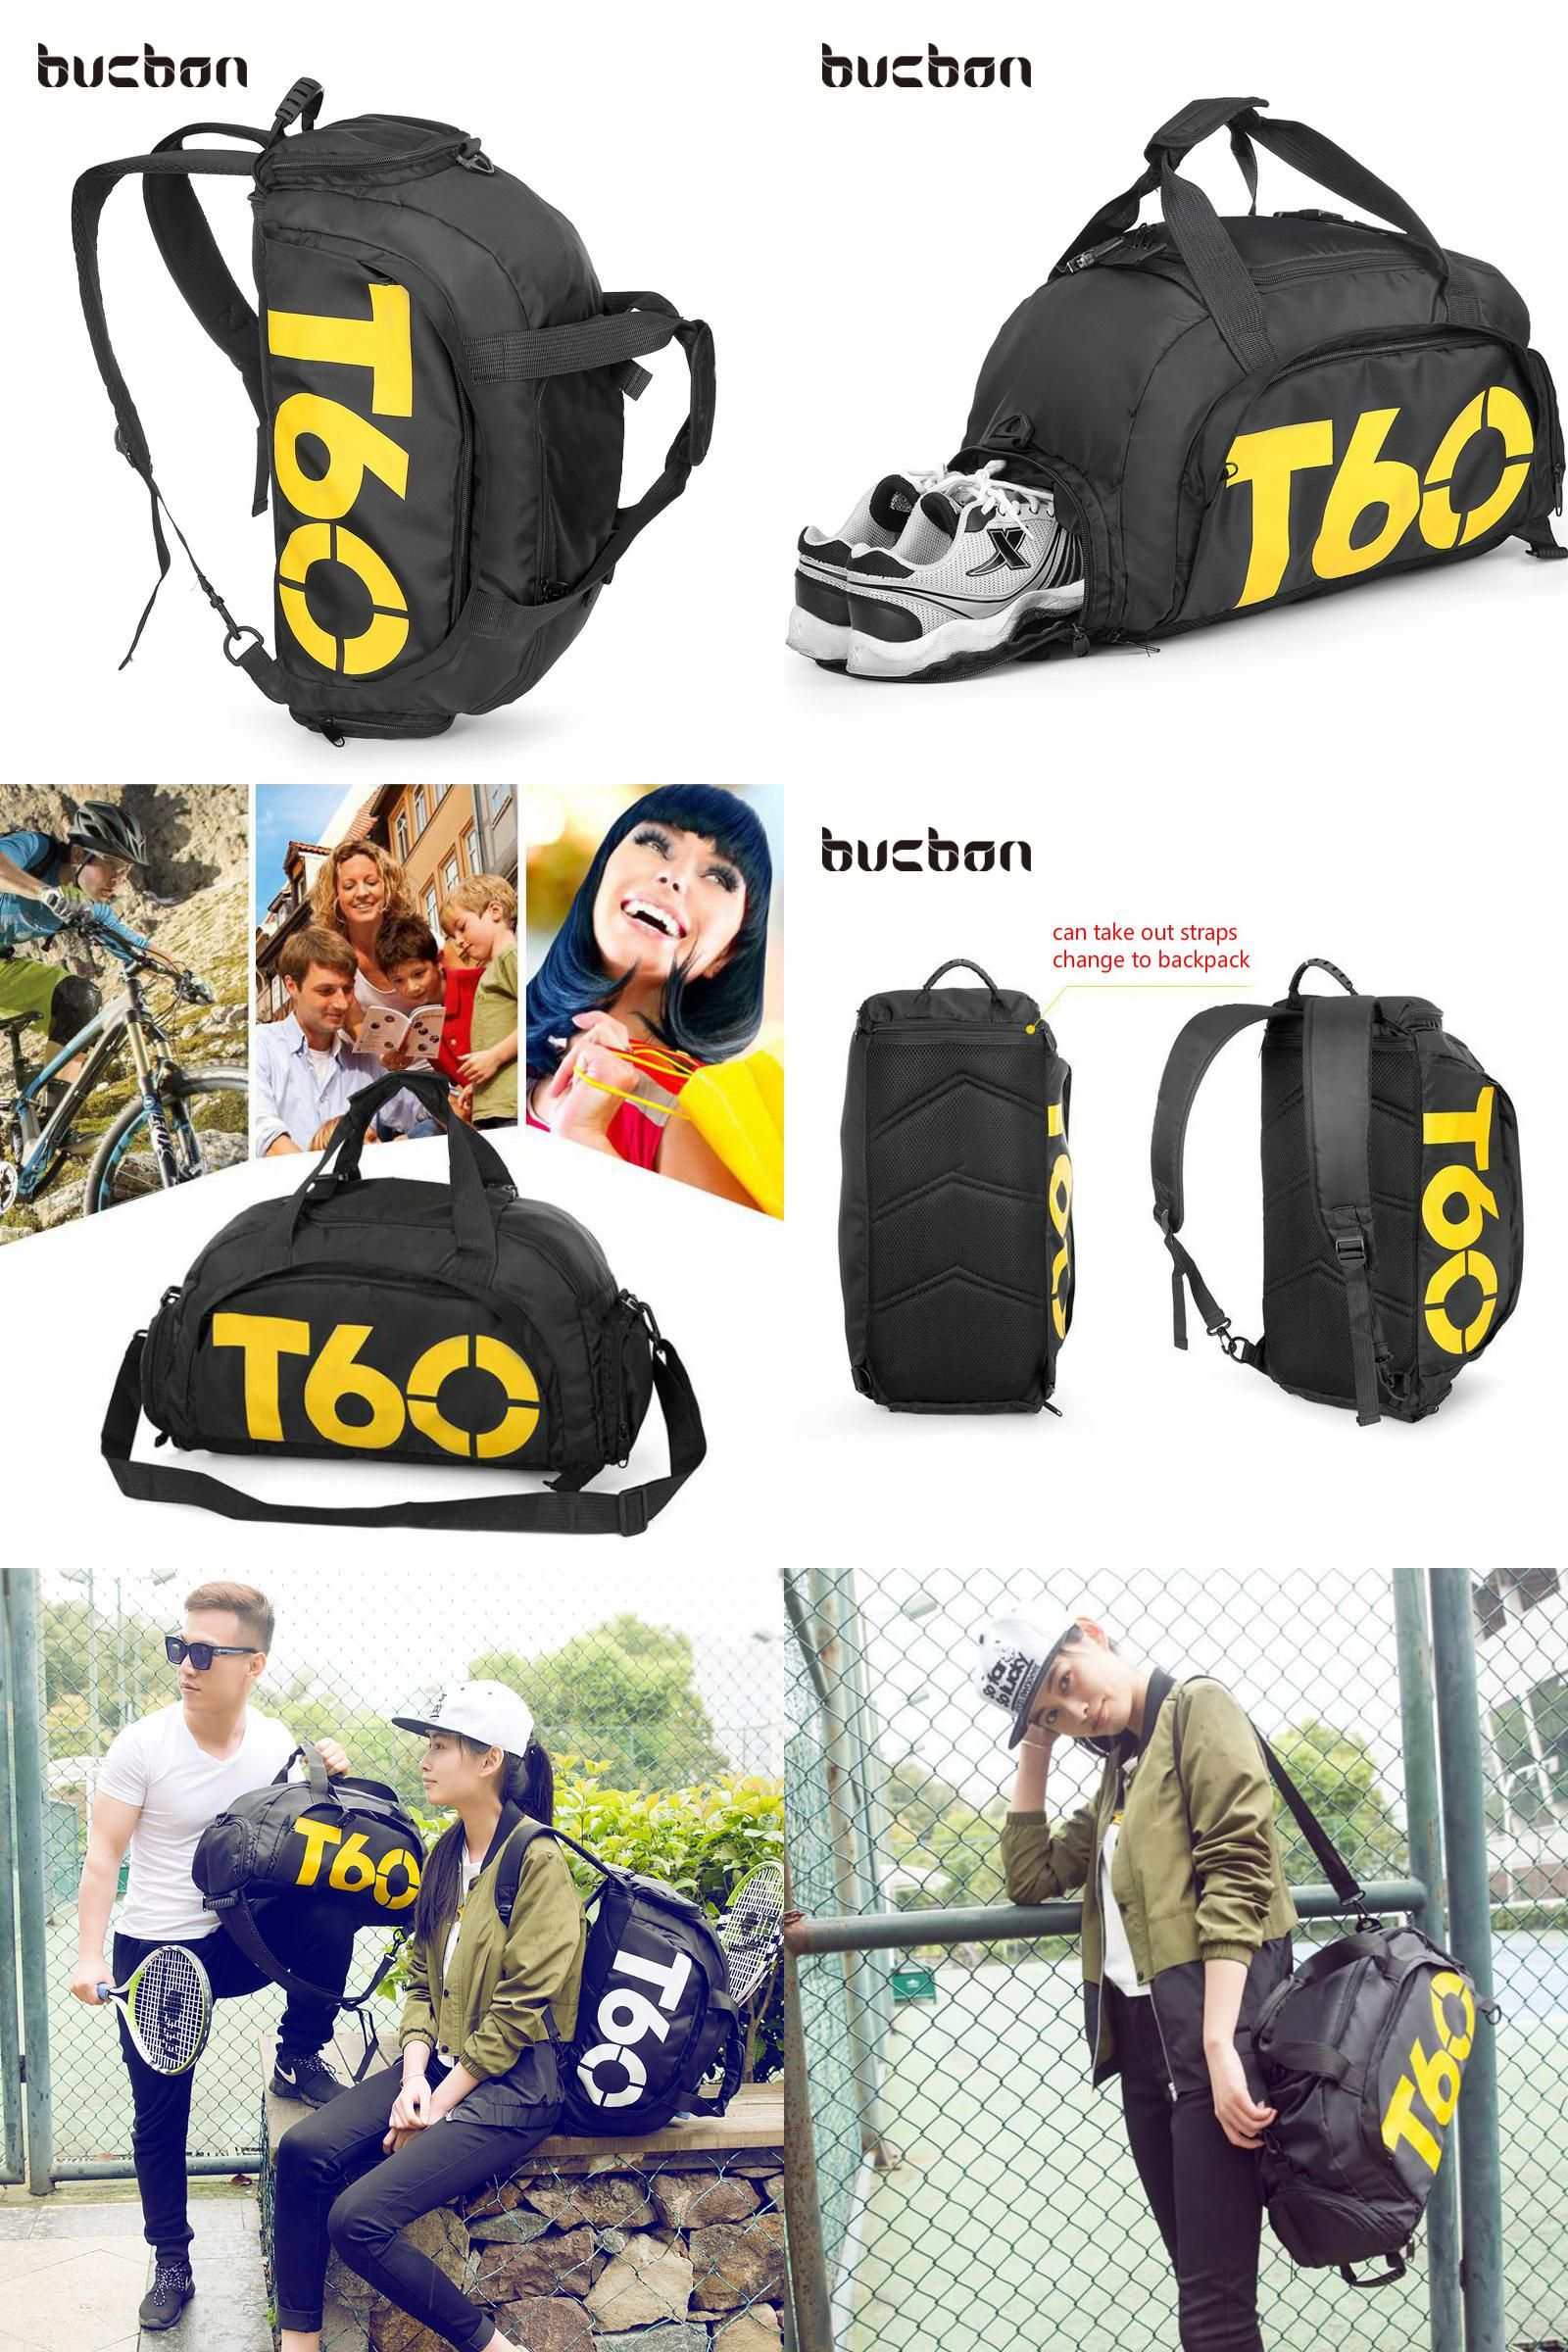 Visit to Buy  Bucbon Multi-use Portable Sports Gym Backpack Shoulder Bag  Separated 63675445475ec